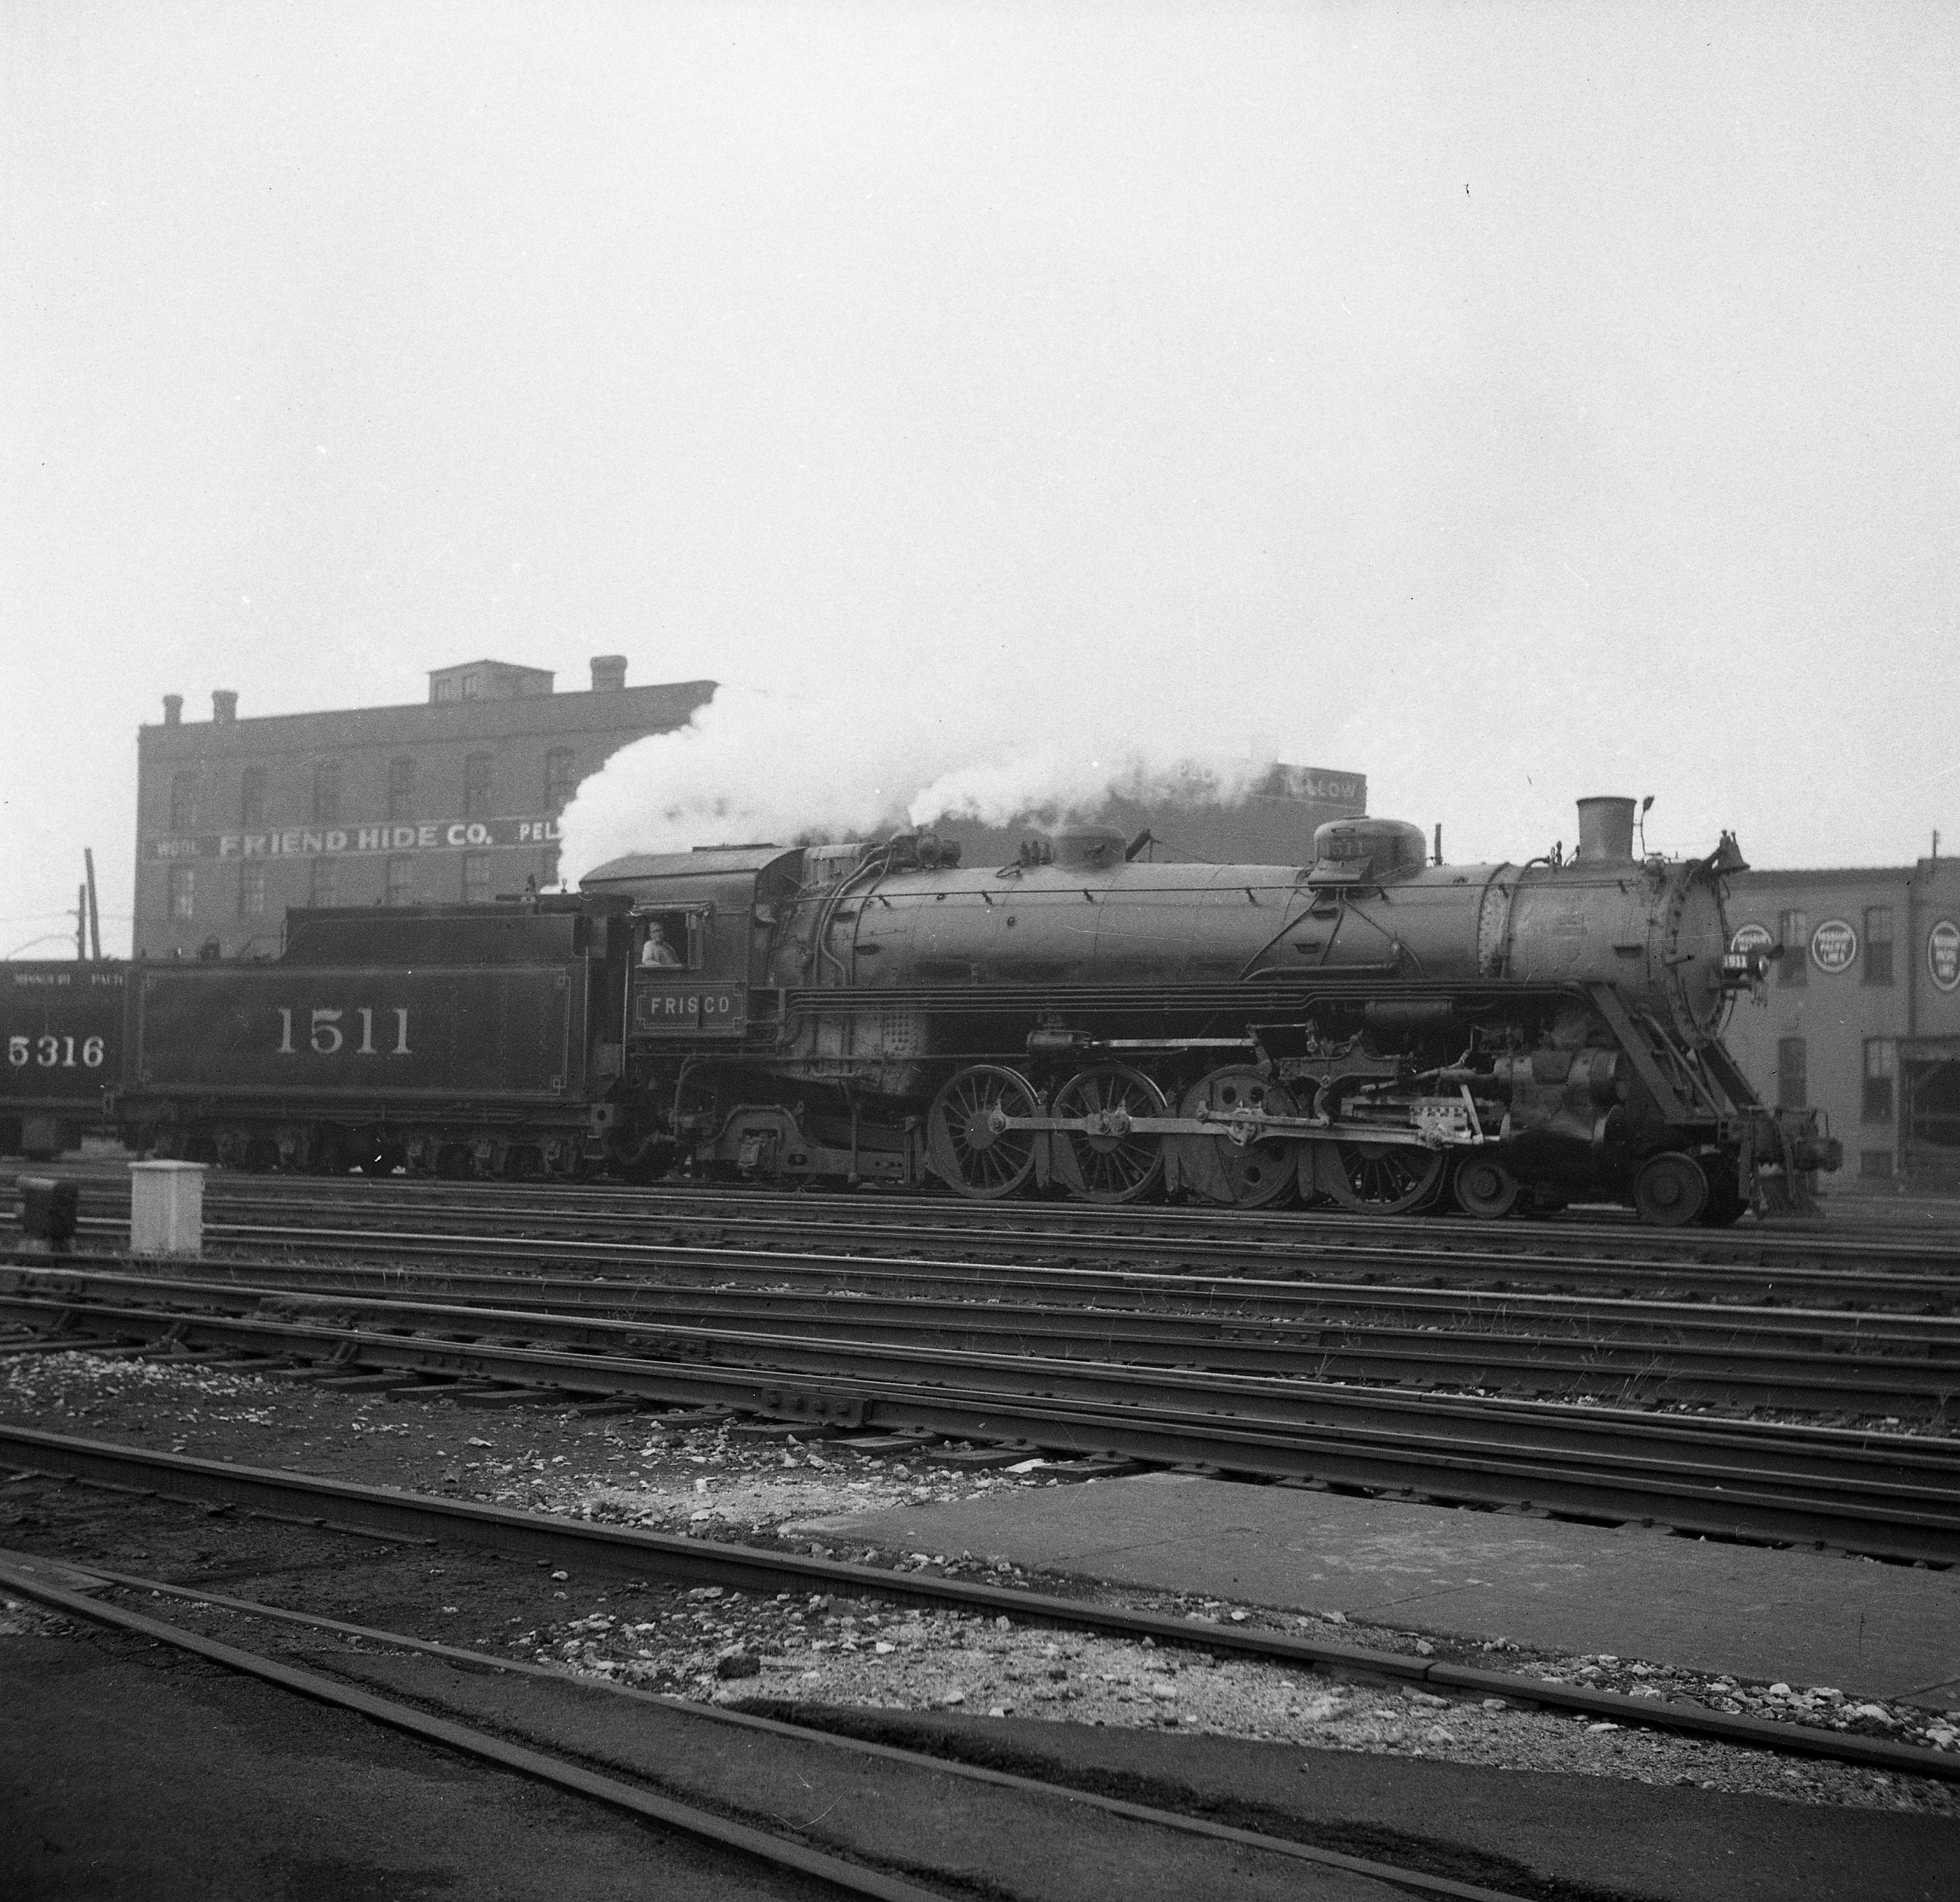 4-8-2 1511 at St. Louis, Missouri (date unknown) (Louis A. Marre)